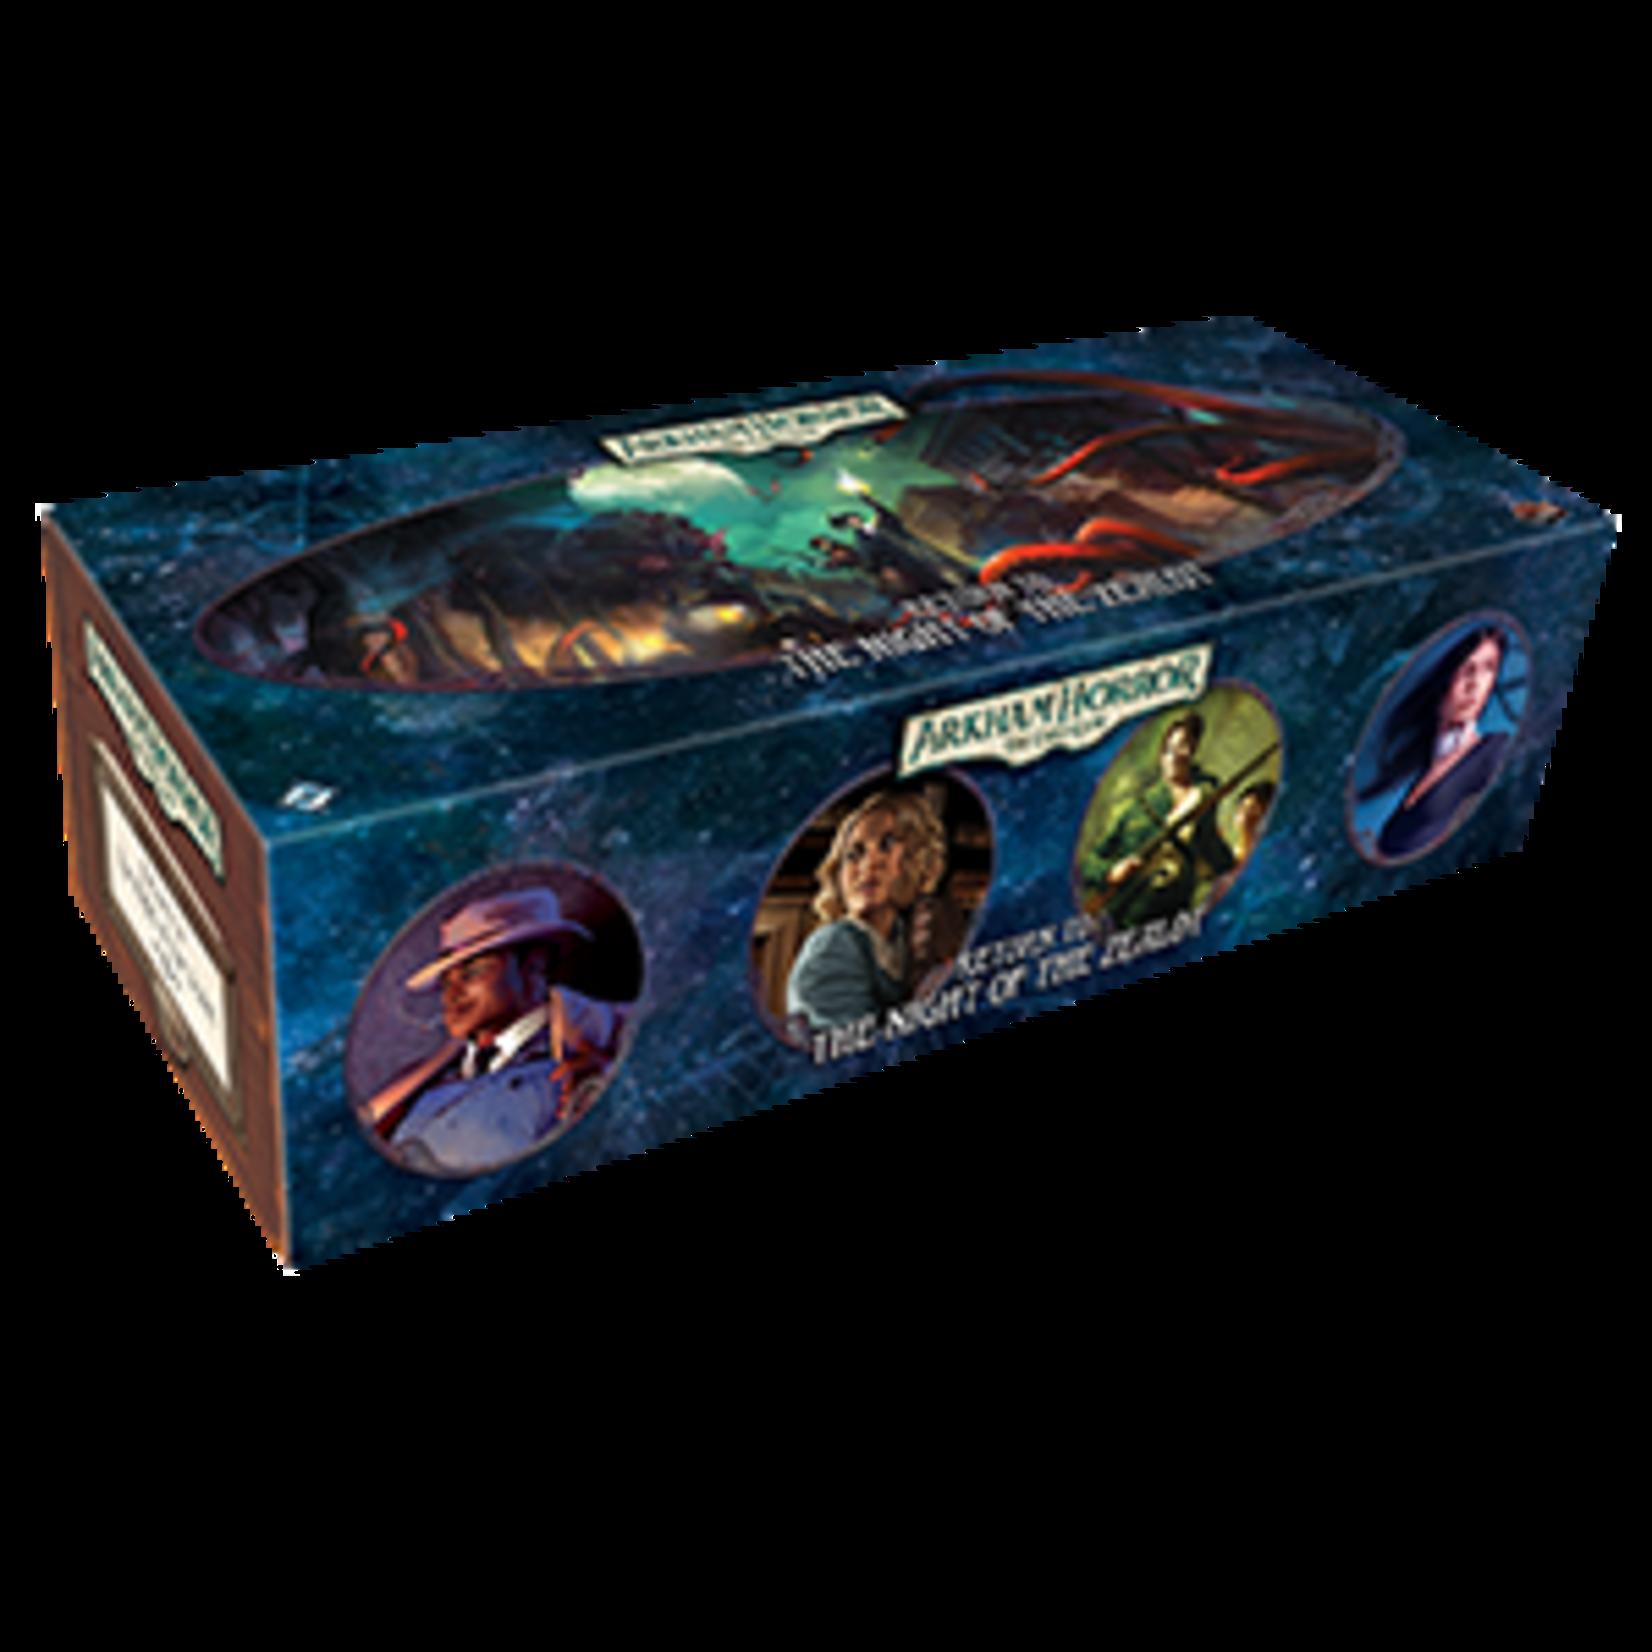 Fantasy Flight Games Arkham Horror LCG - Return of the Night of the Zealot Expansion